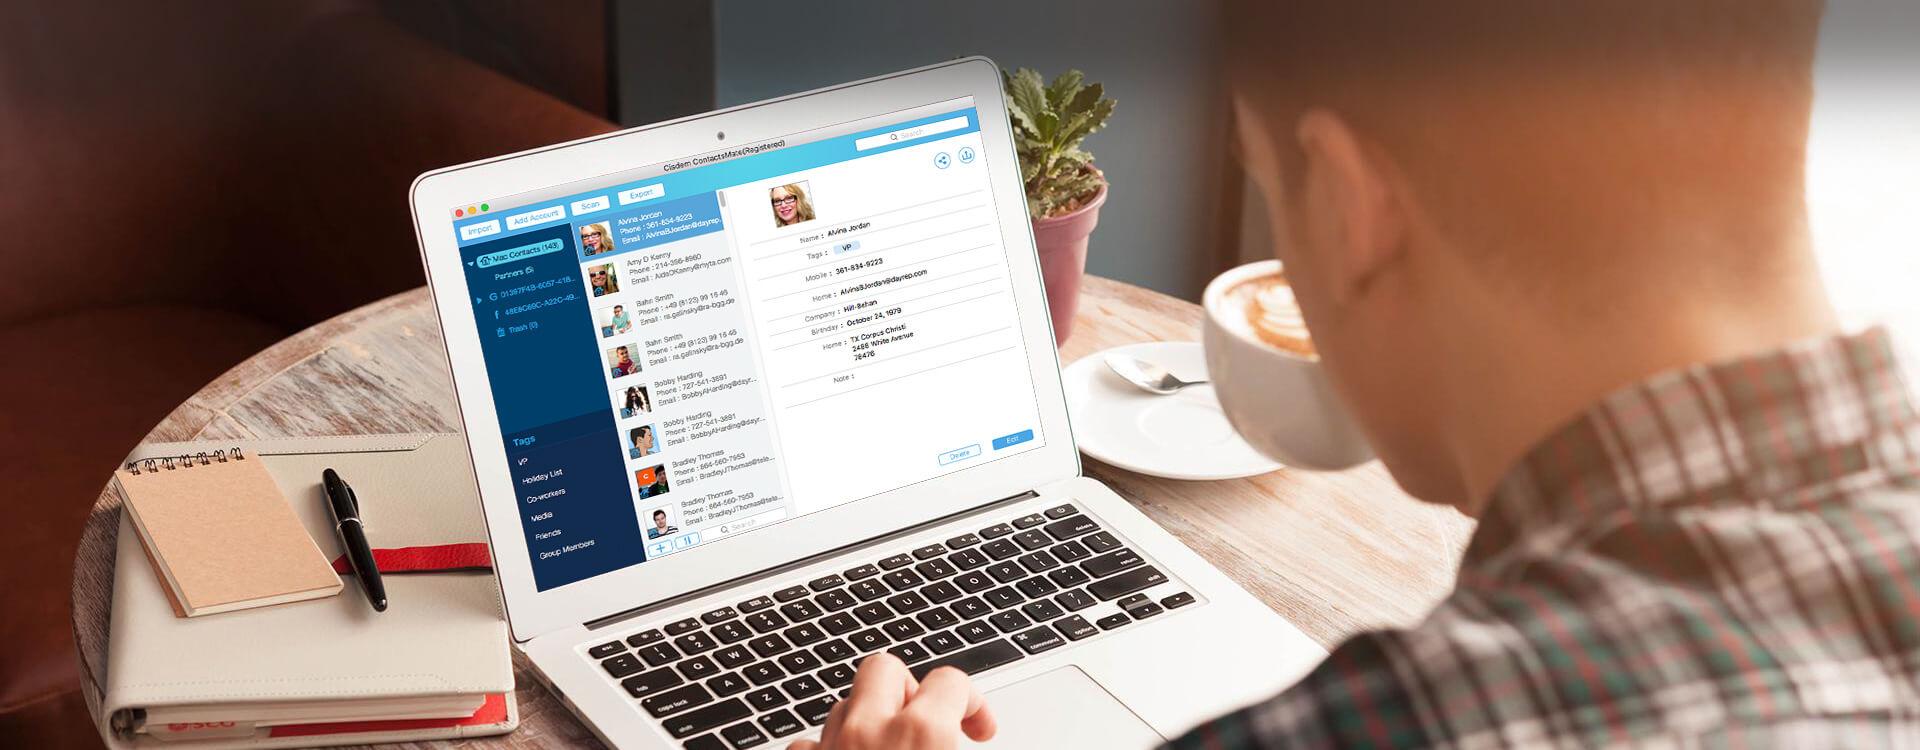 Cisdem ContactsMate 5.7.0 Mac 破解版 - 联系人管理工具